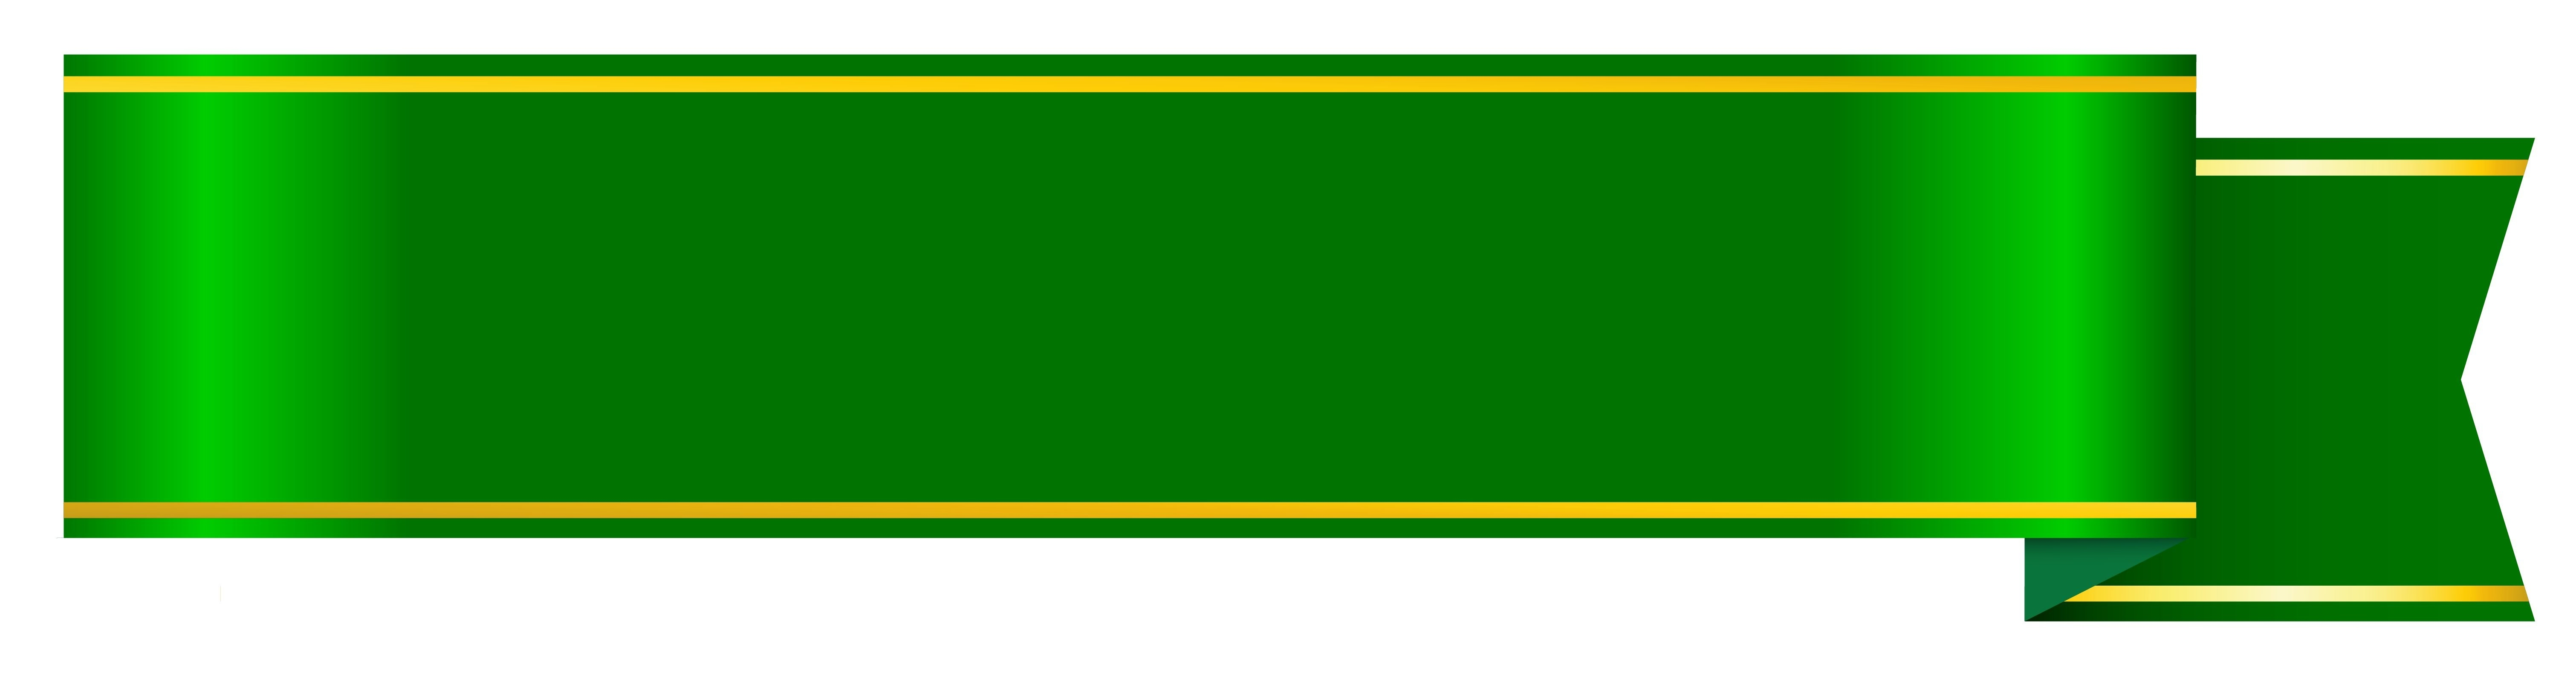 Green Ribbon Banner Clipart | Free Design Templates